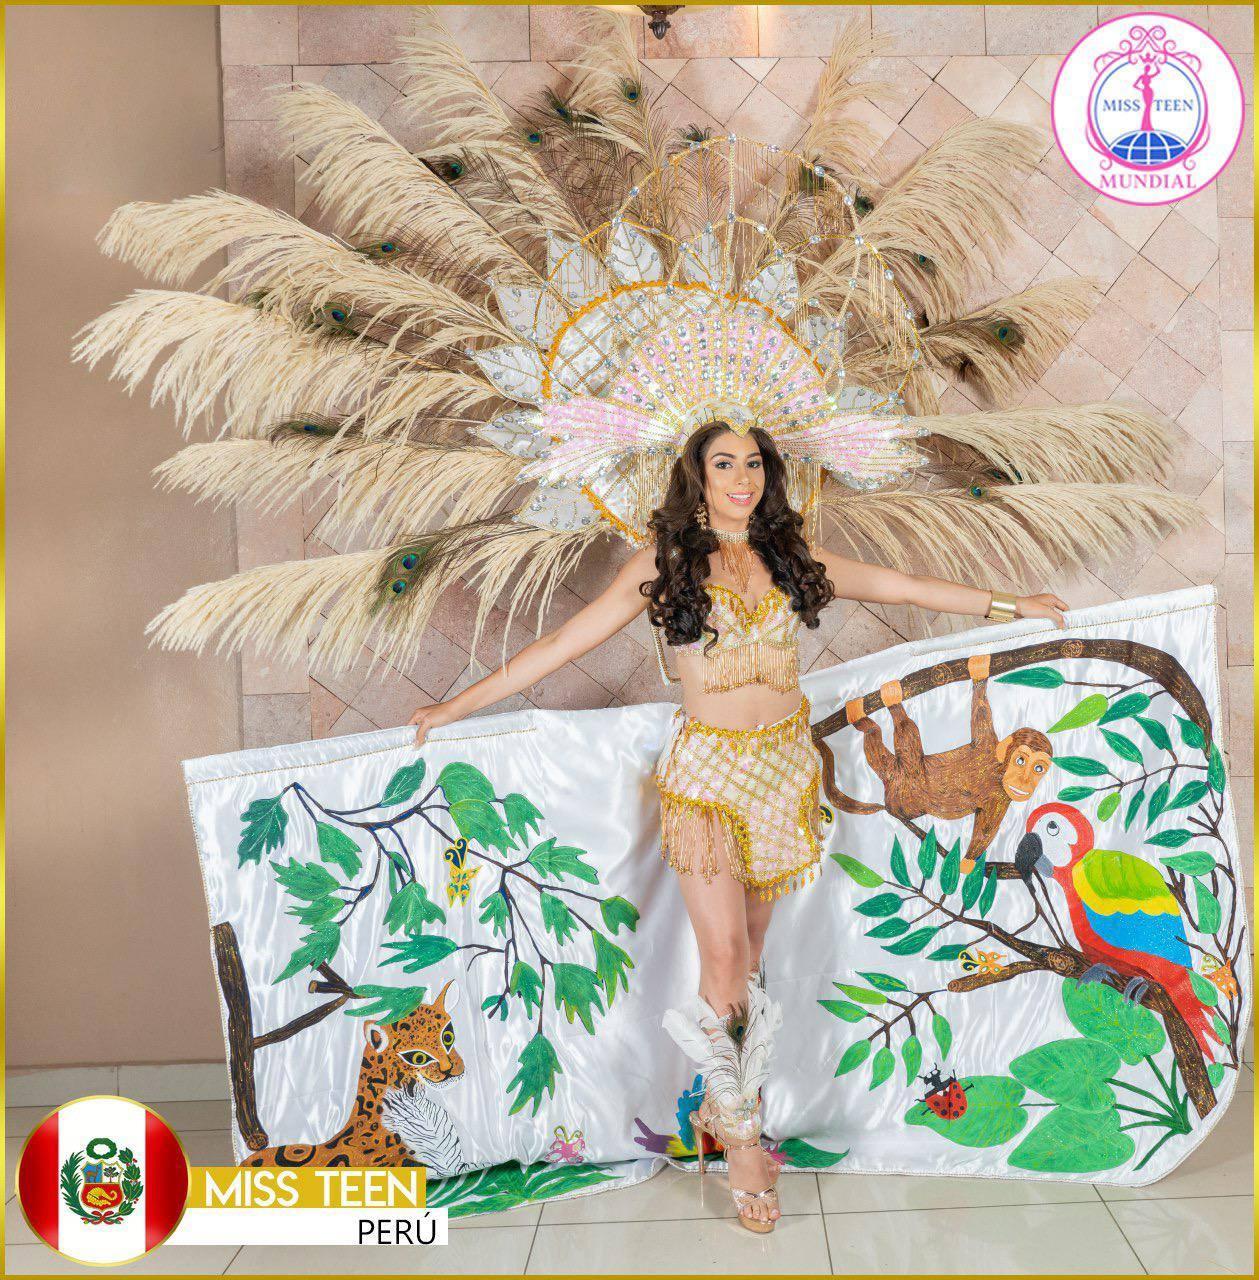 romina lopez, top 12 de miss teen mundial 2019. - Página 4 60836510